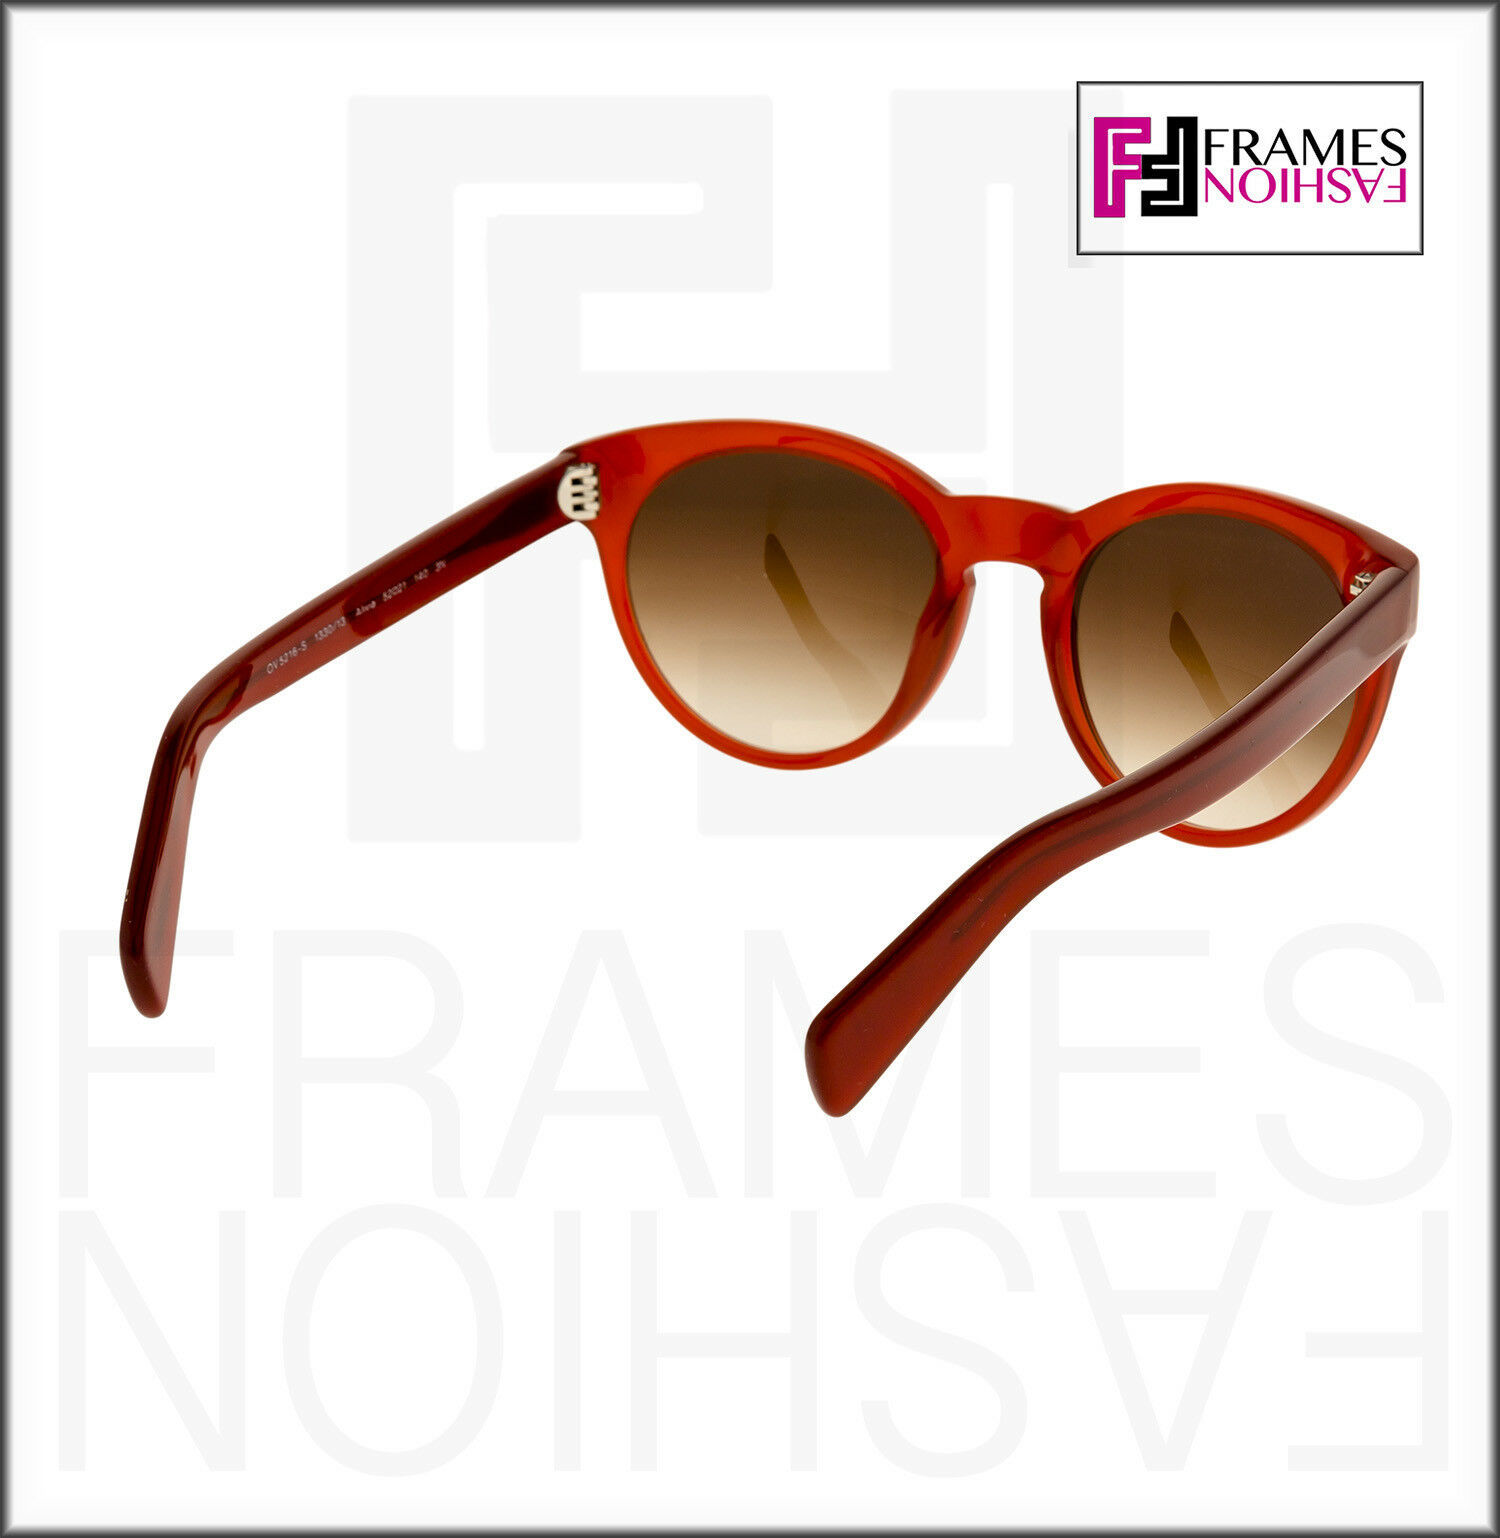 OLIVER PEOPLES ALIVIA OV5216S Red Blood Translucent Brown Round Sunglasses 5216 image 4